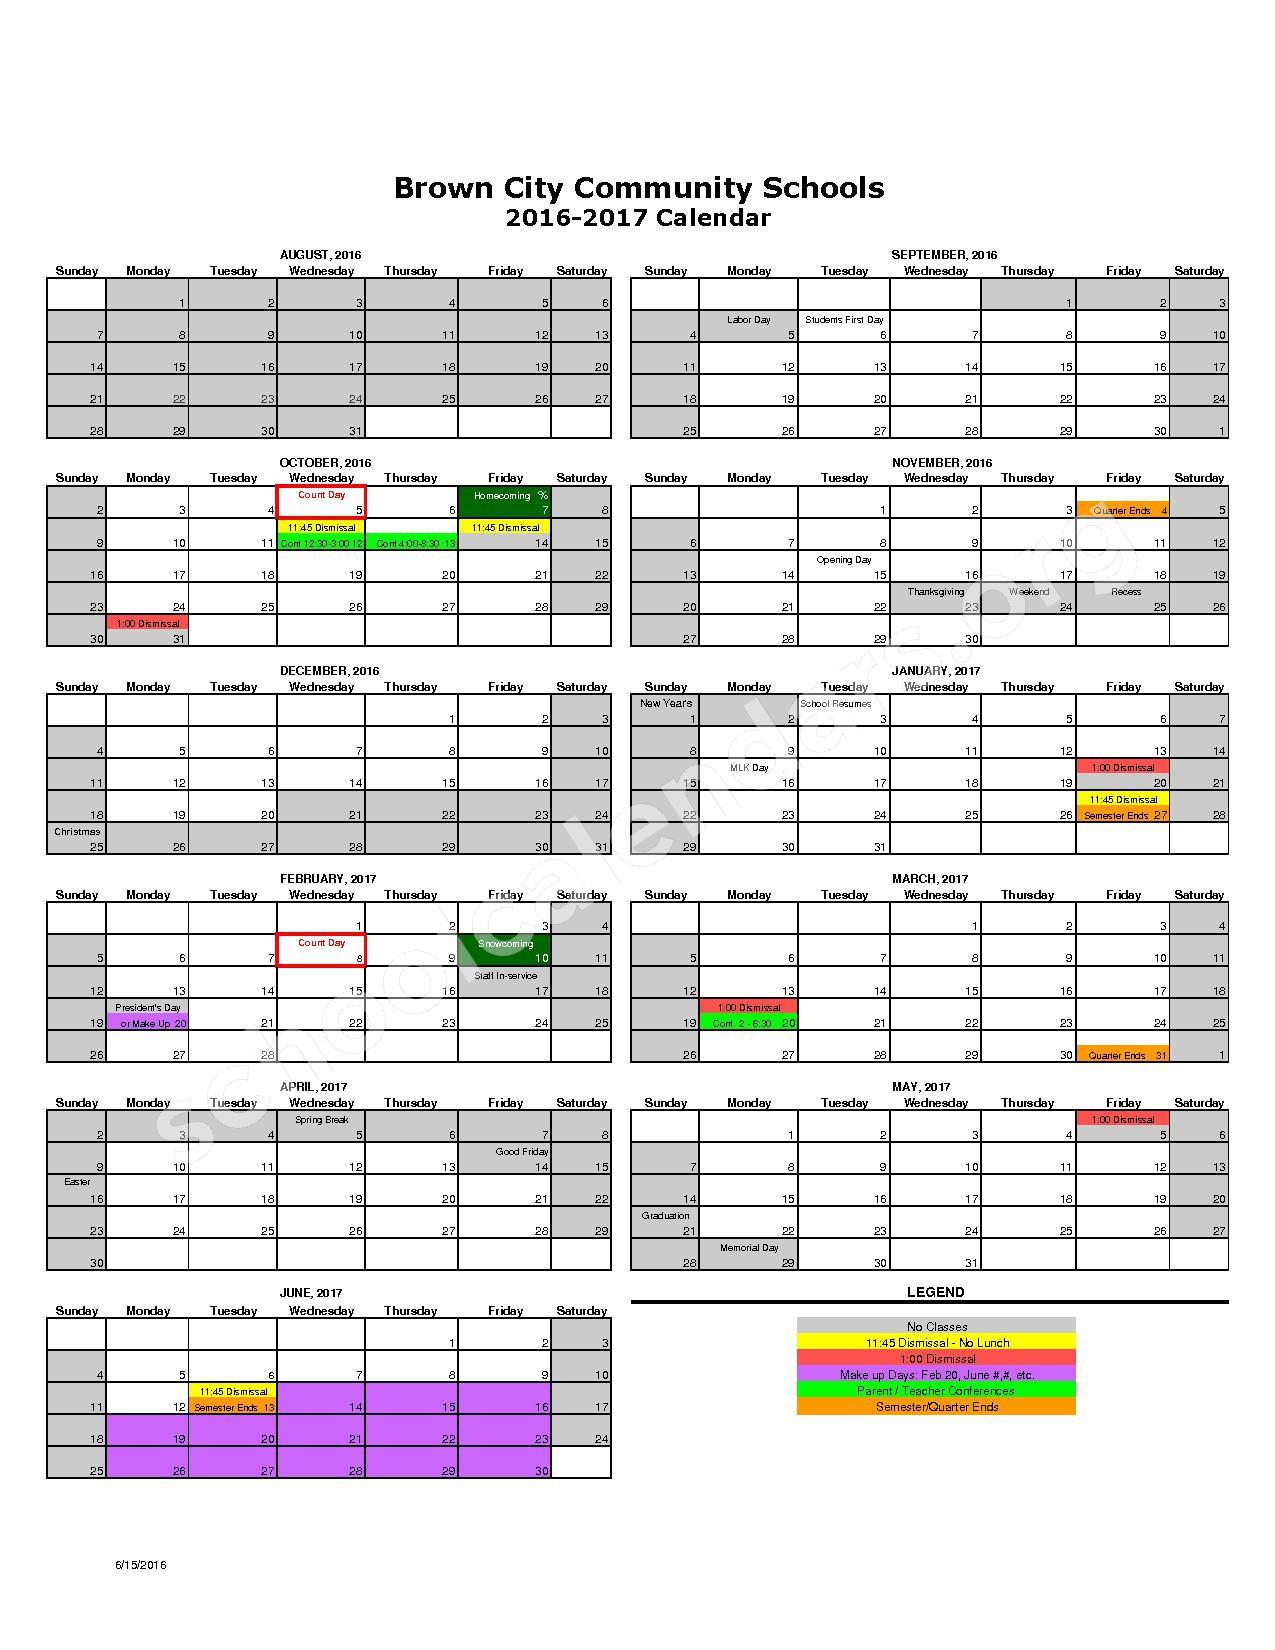 2016 - 2017 District Calendar – Brown City Community Schools – page 1